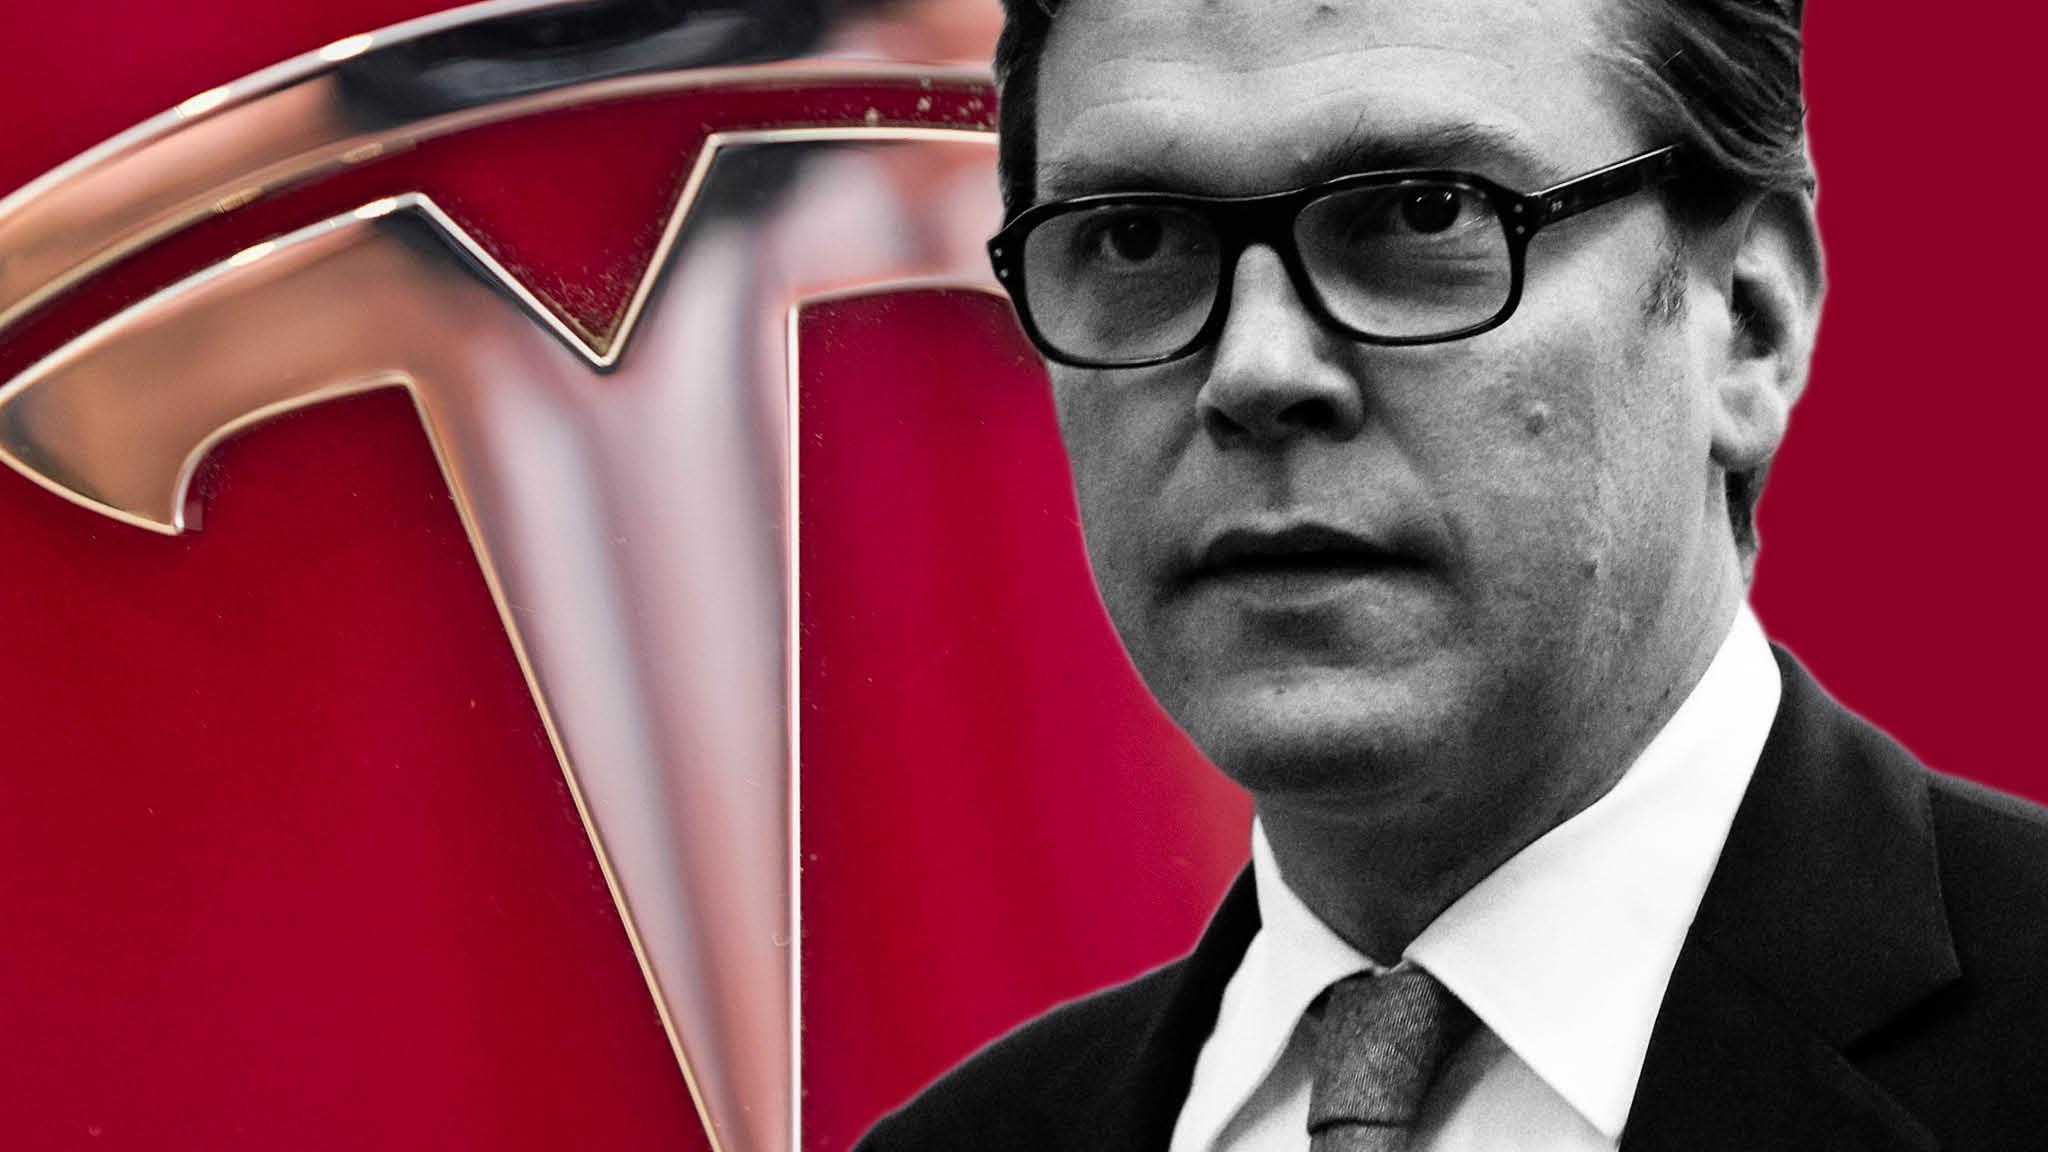 James Murdoch in line to replace Elon Musk as Tesla chair